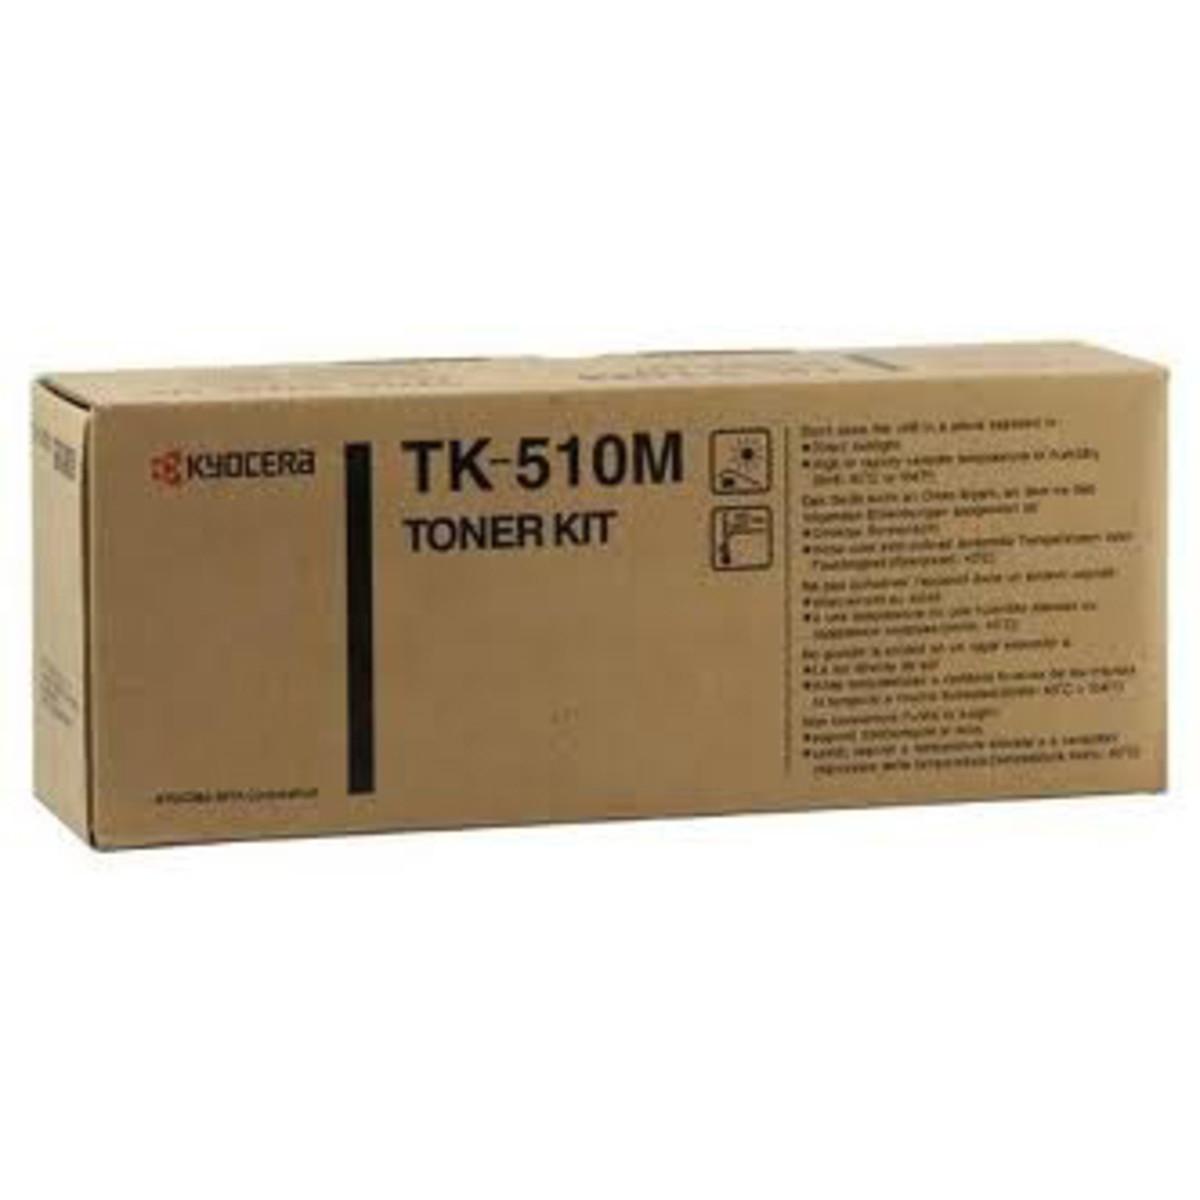 Kyocera TK-510M Magenta Toner Cartridge